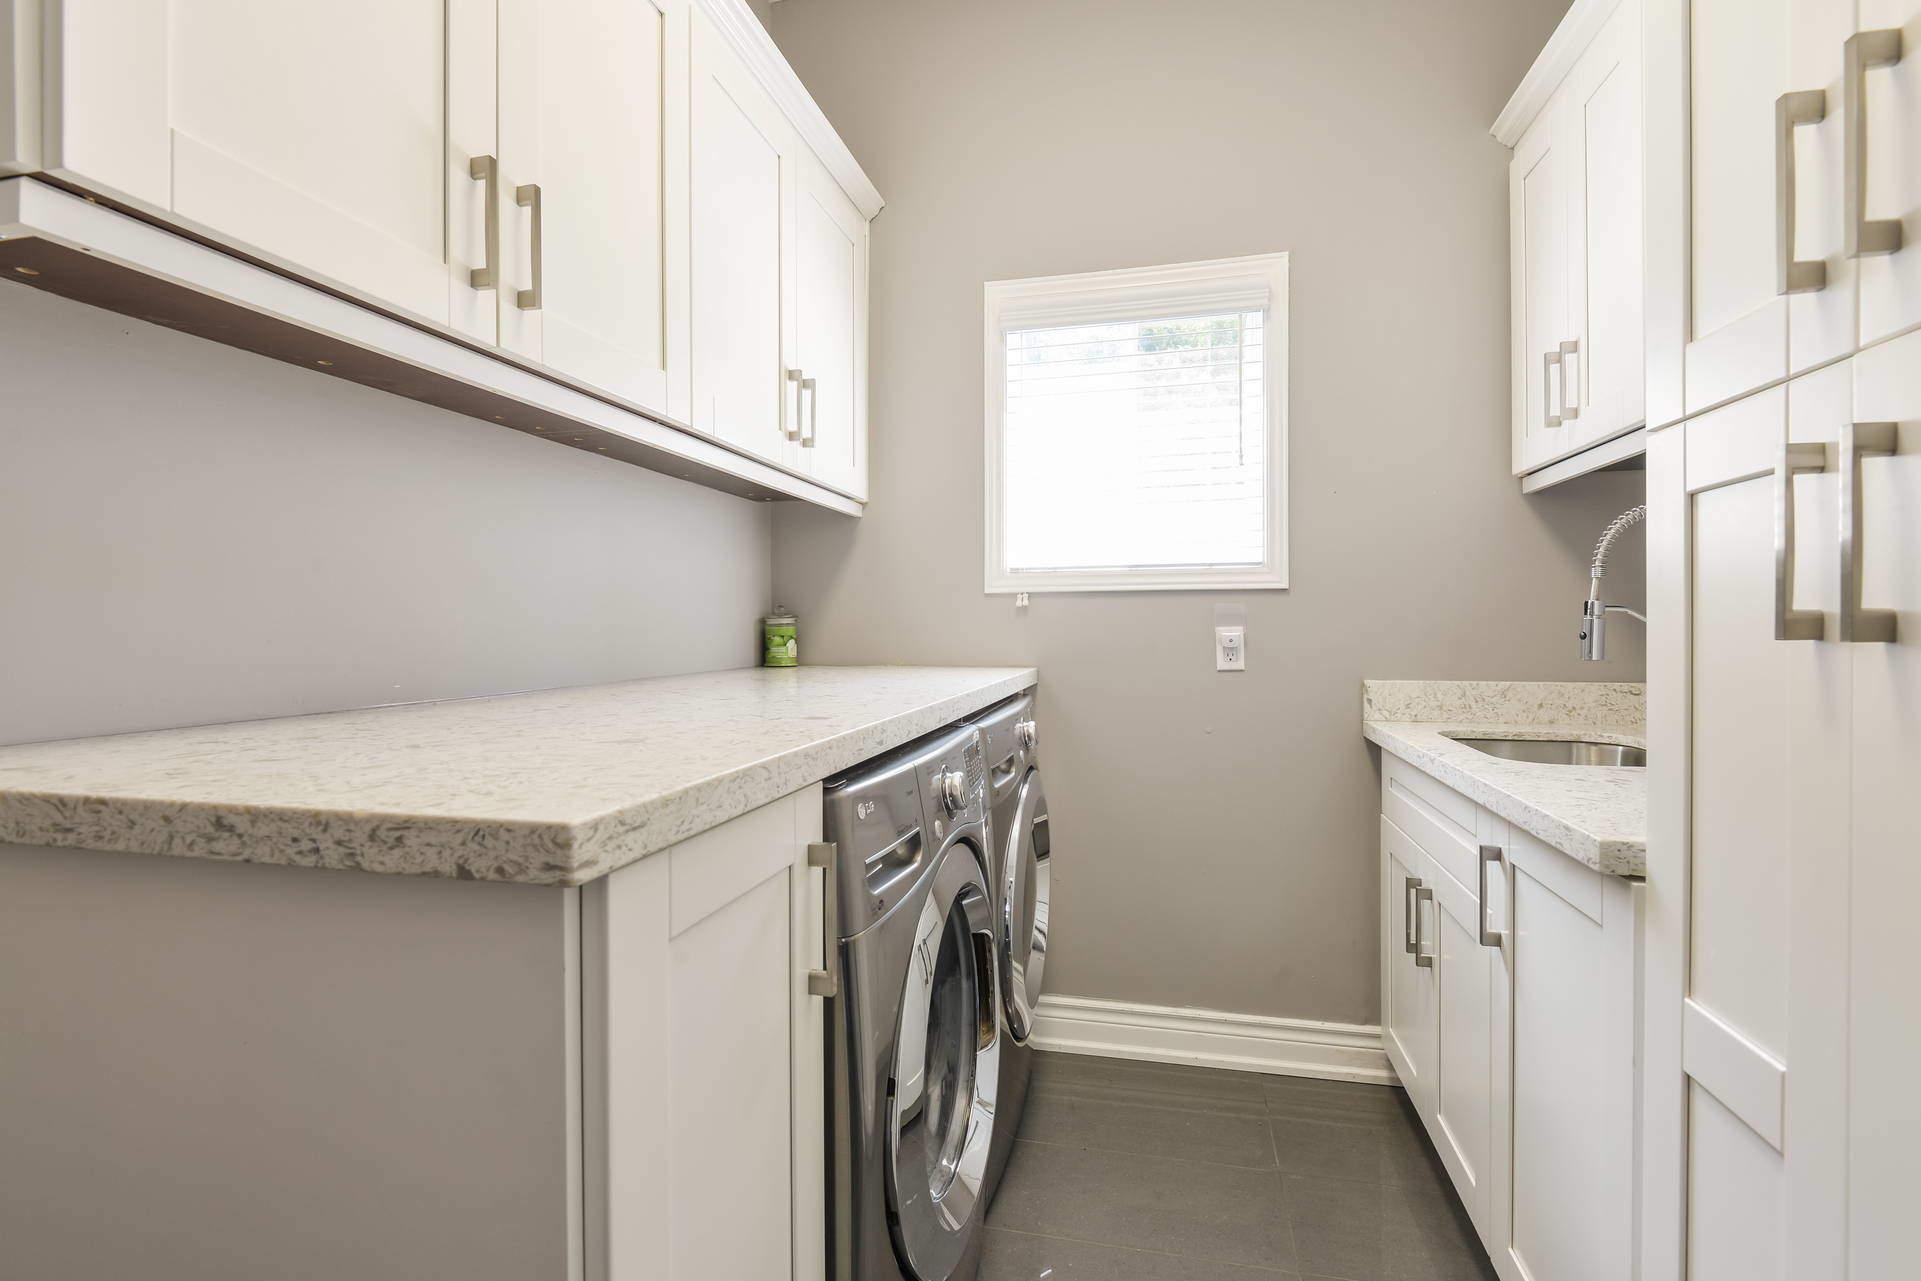 013-Laundry